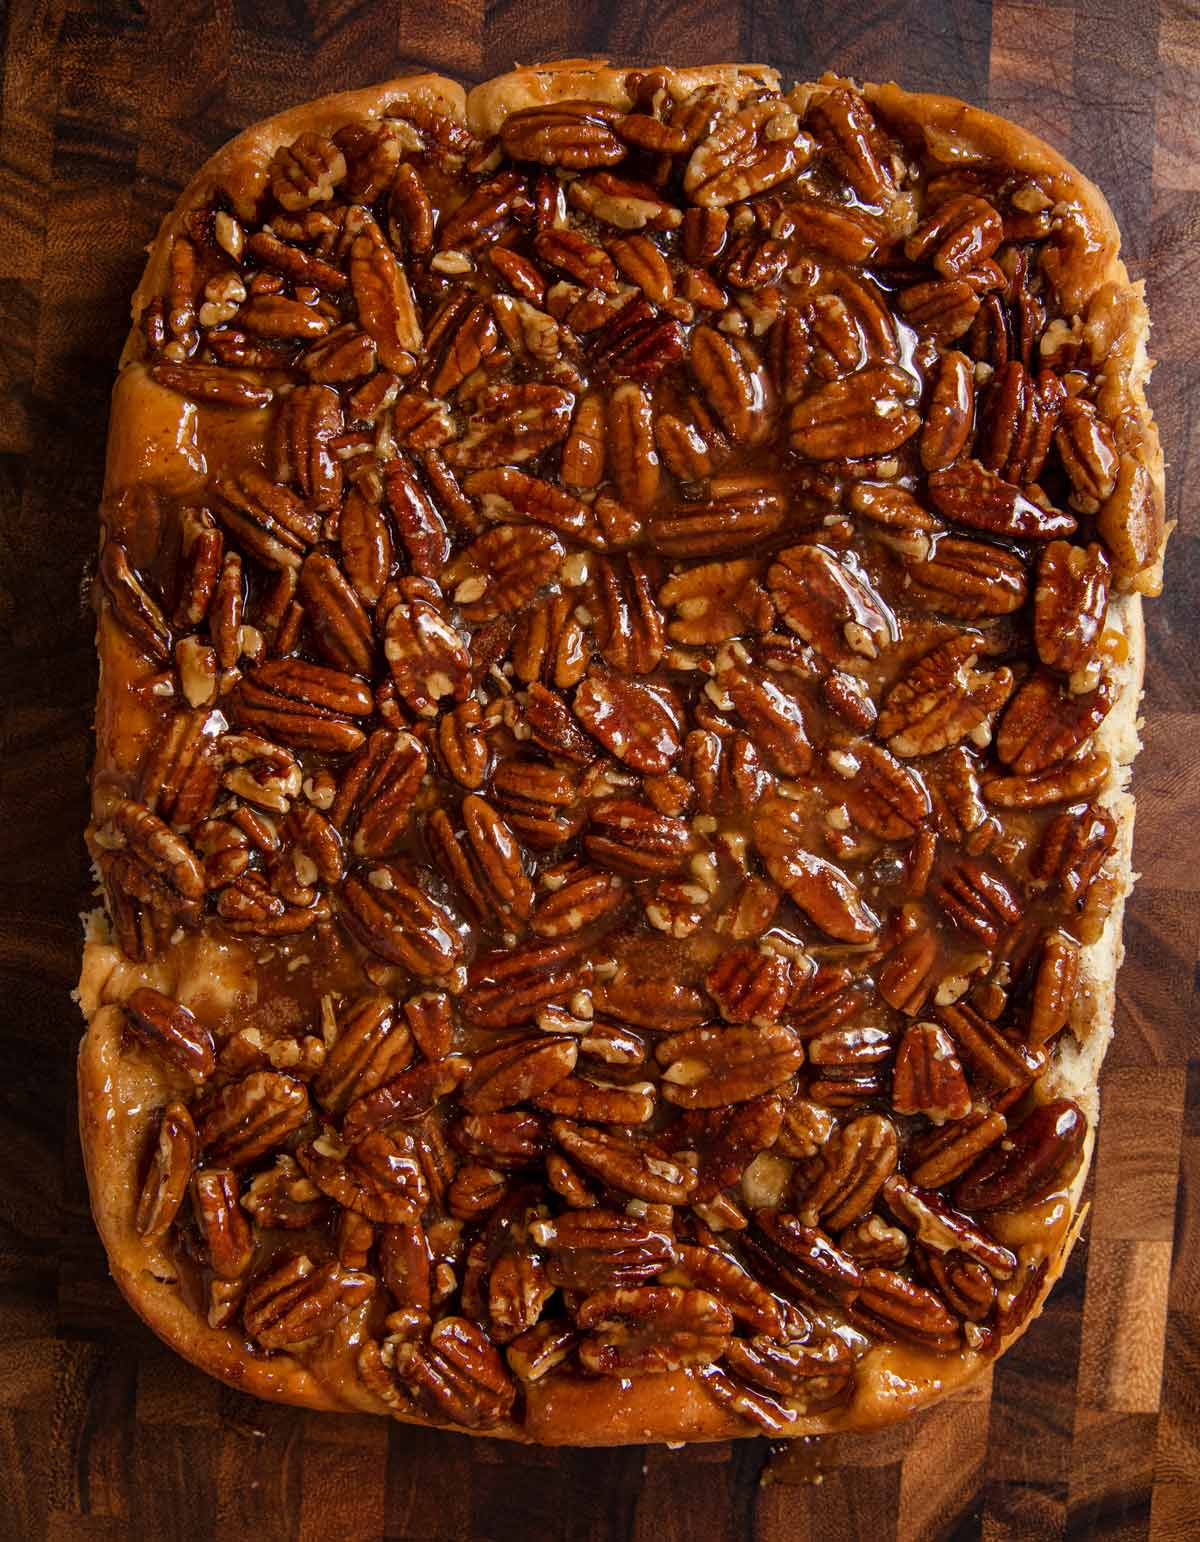 baked Caramel Pecan Cinnamon Rolls on cutting board